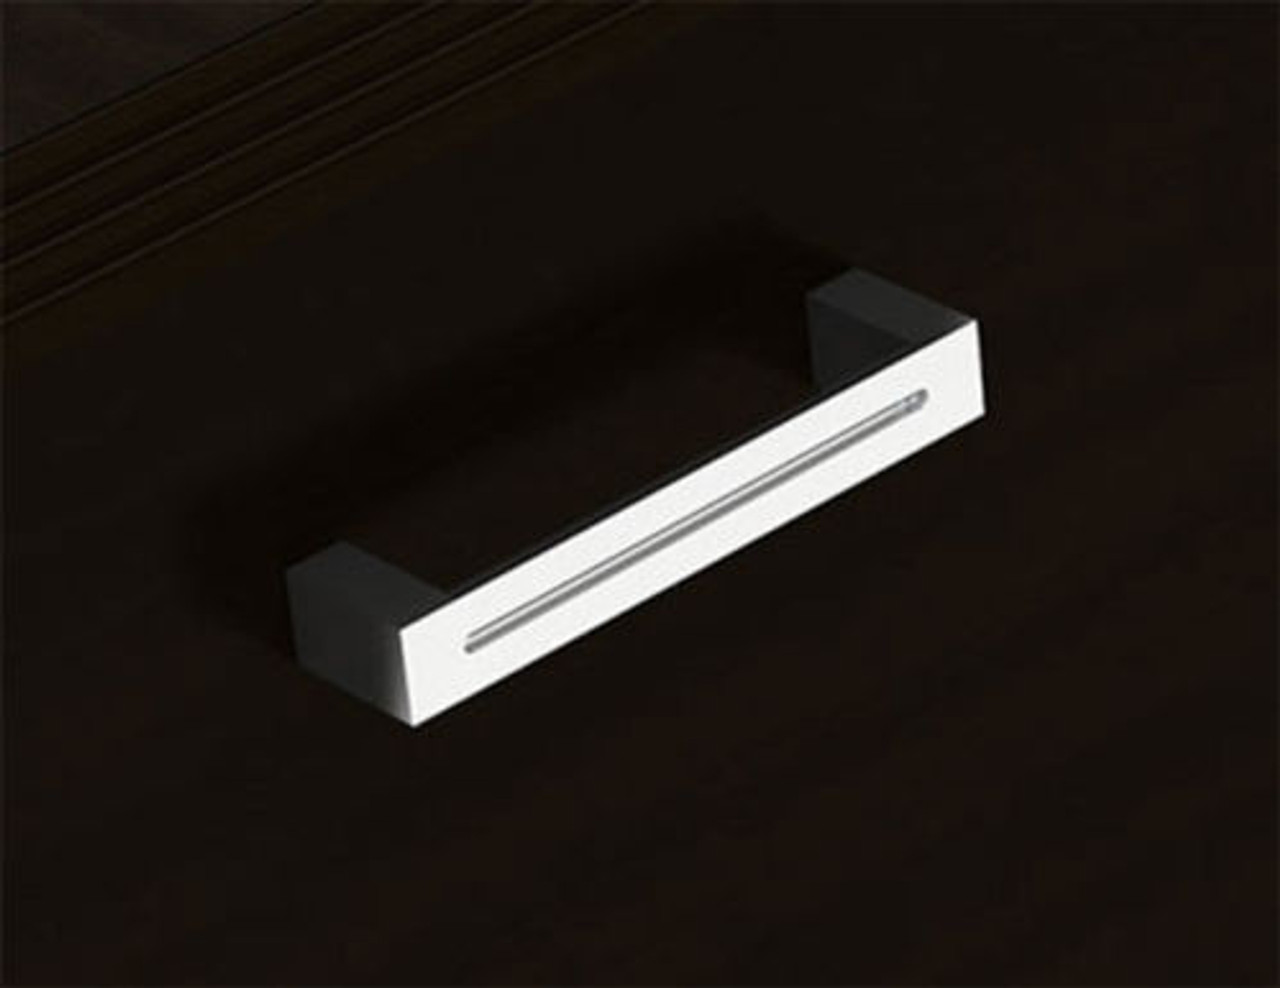 12pc 12' Feet U Shaped Glass Counter Reception Desk Set, #CH-AMB-R25